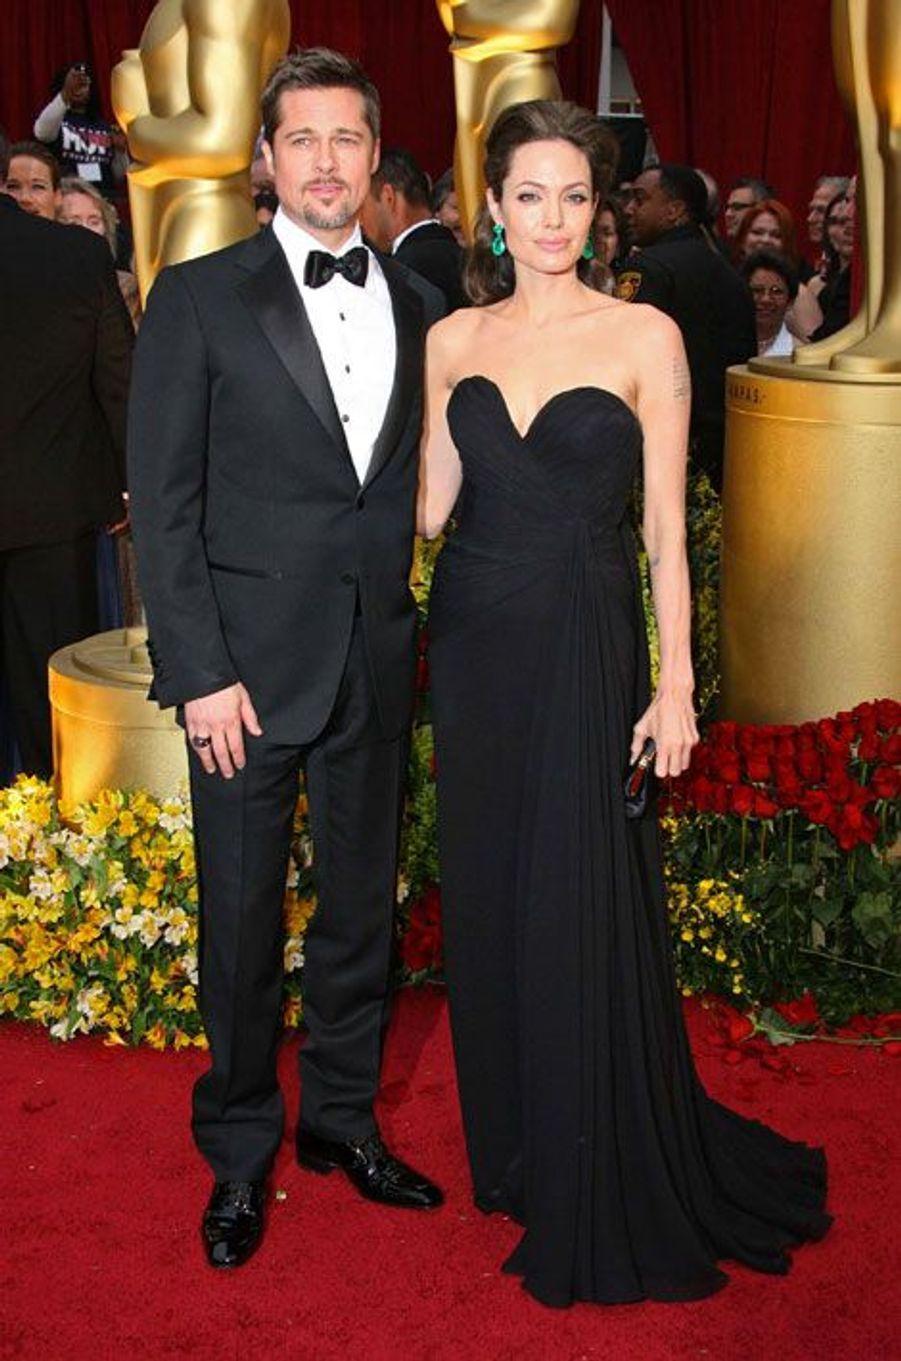 Février 2009, aux Oscars